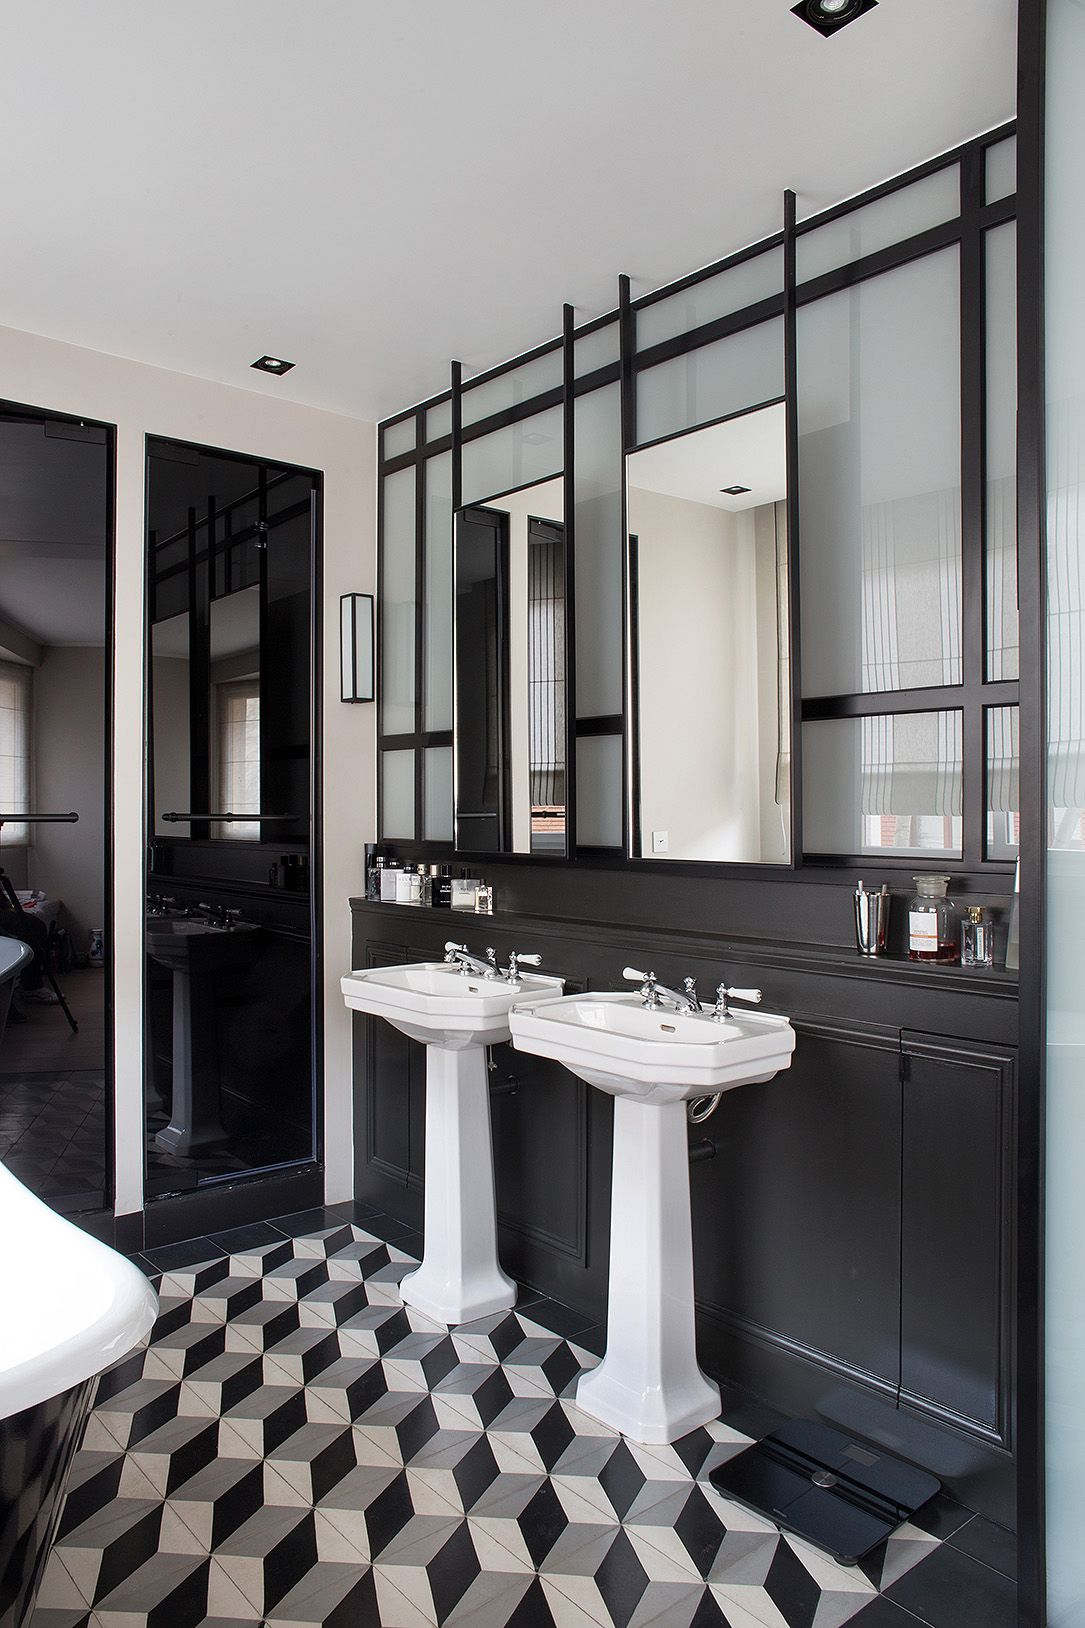 square du roule marion d riot awesome environments. Black Bedroom Furniture Sets. Home Design Ideas